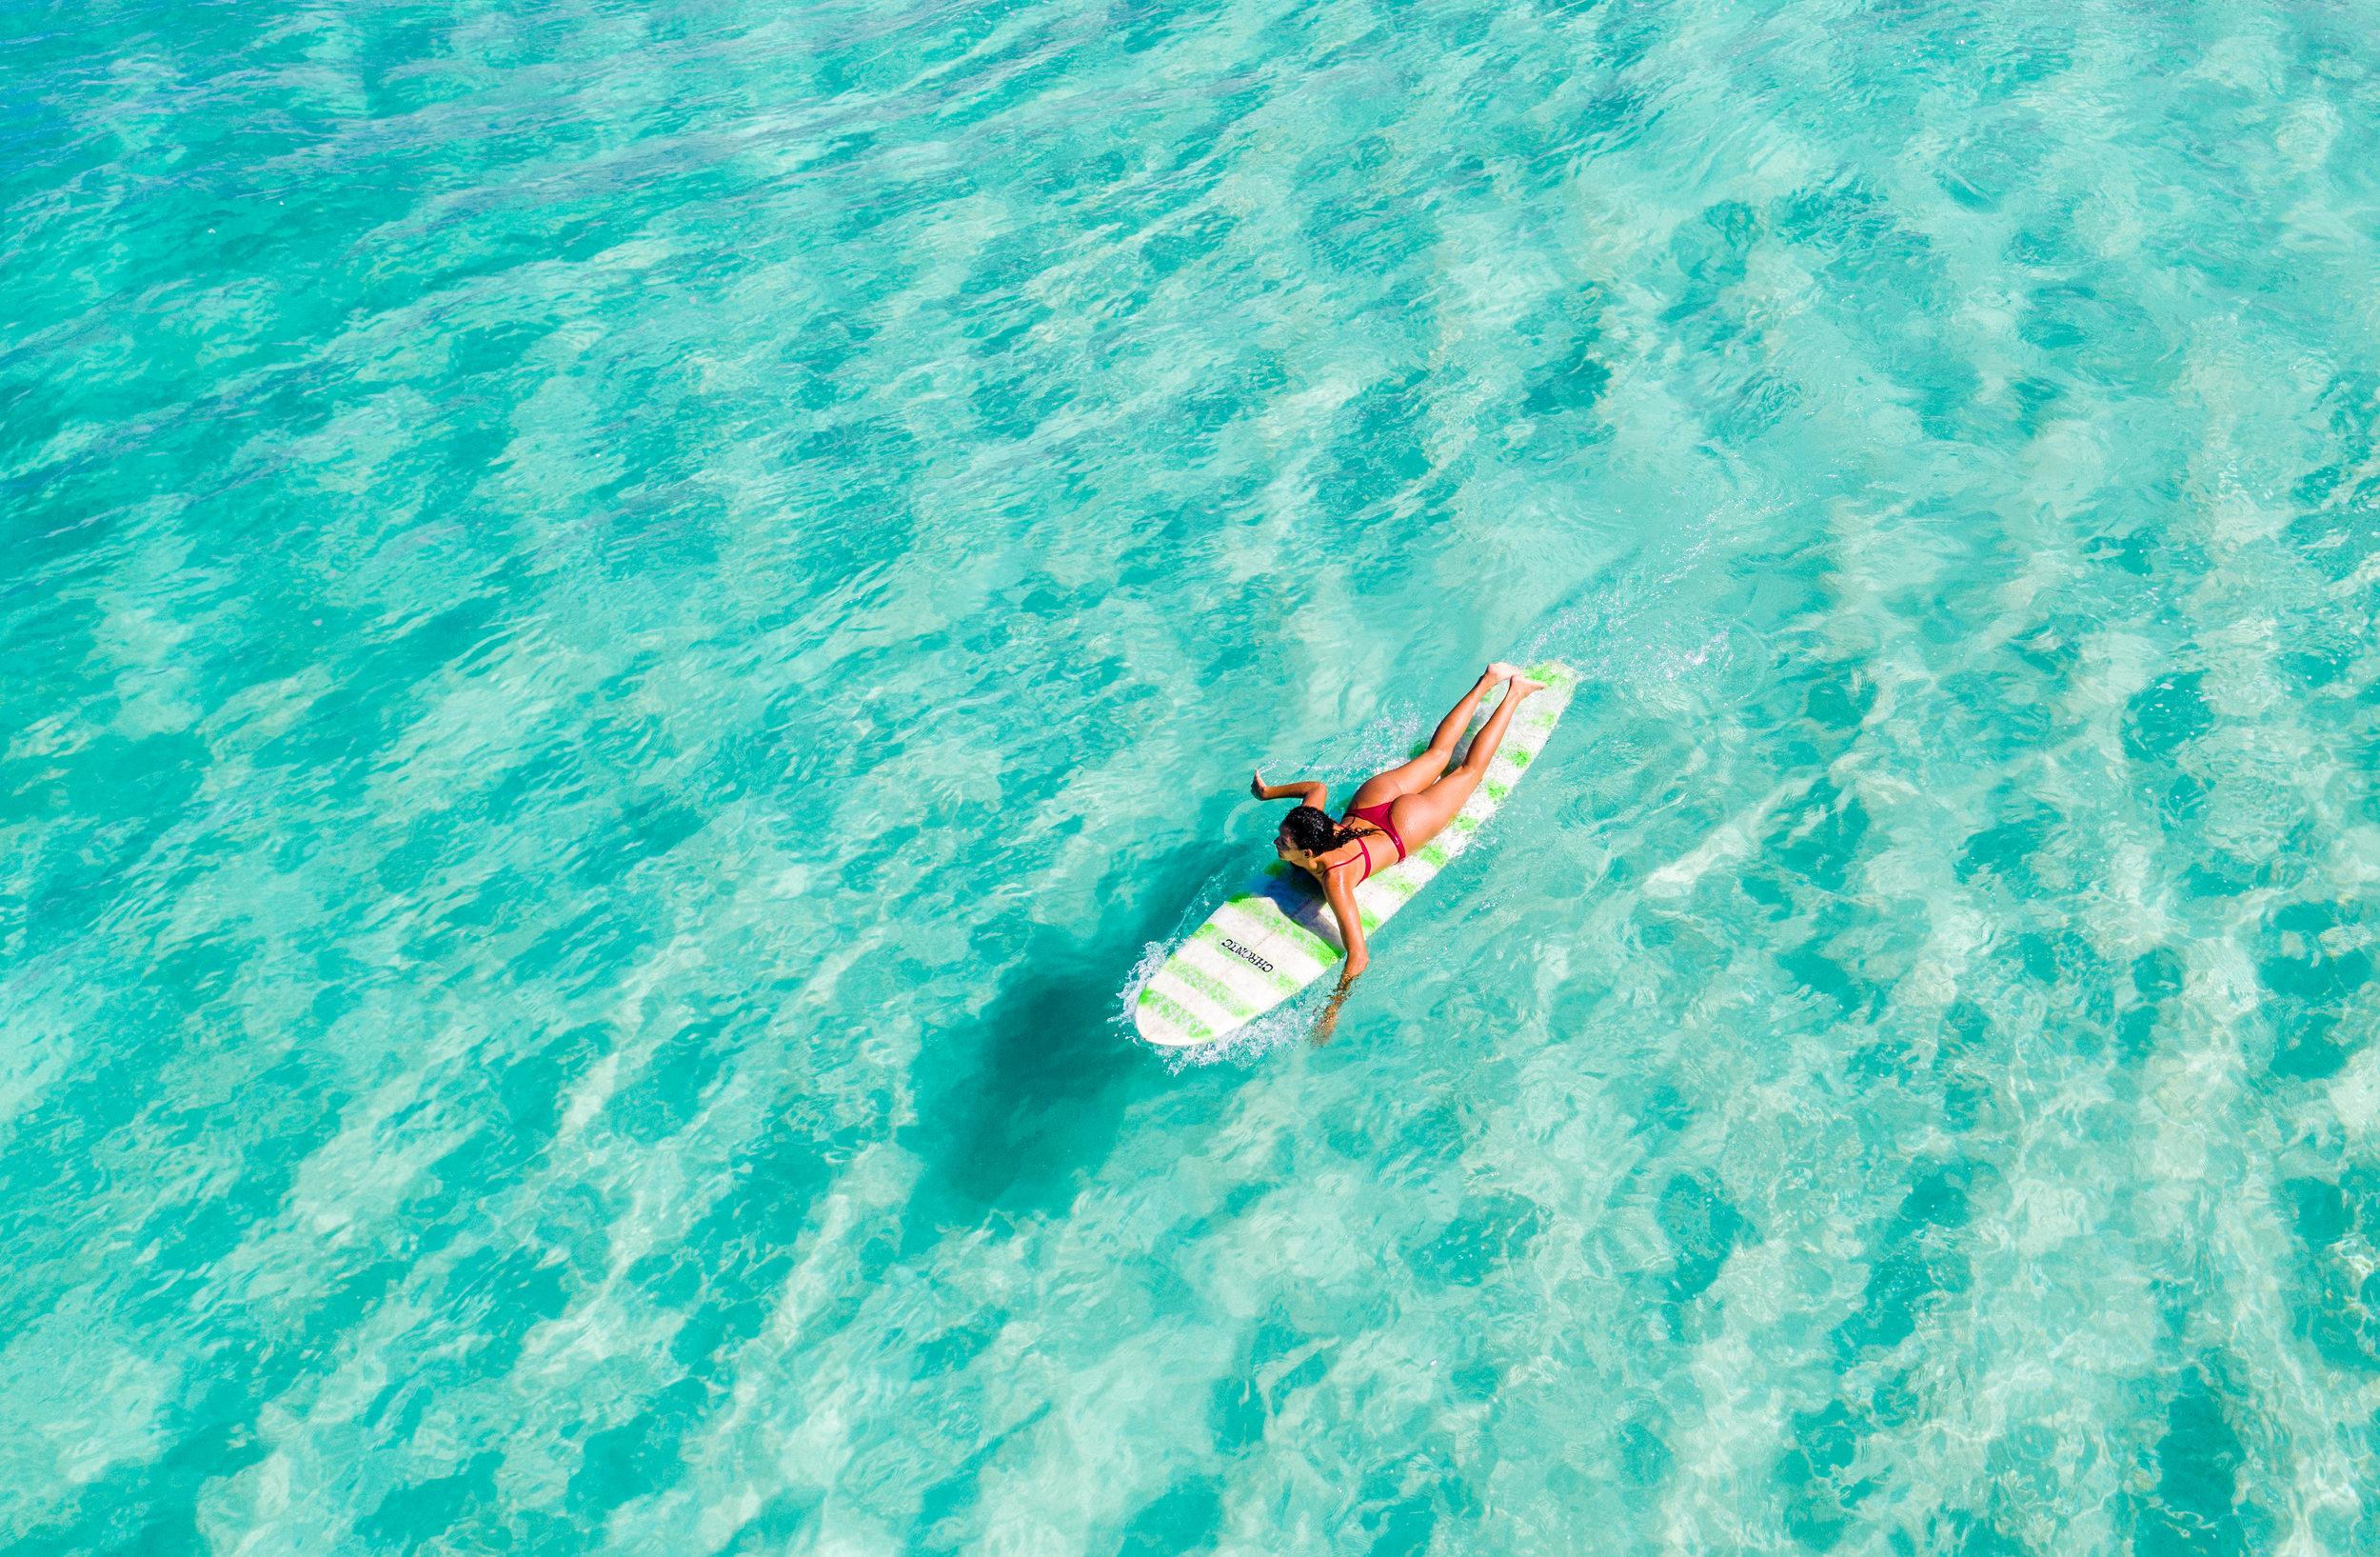 DJI drone surfing hawaii